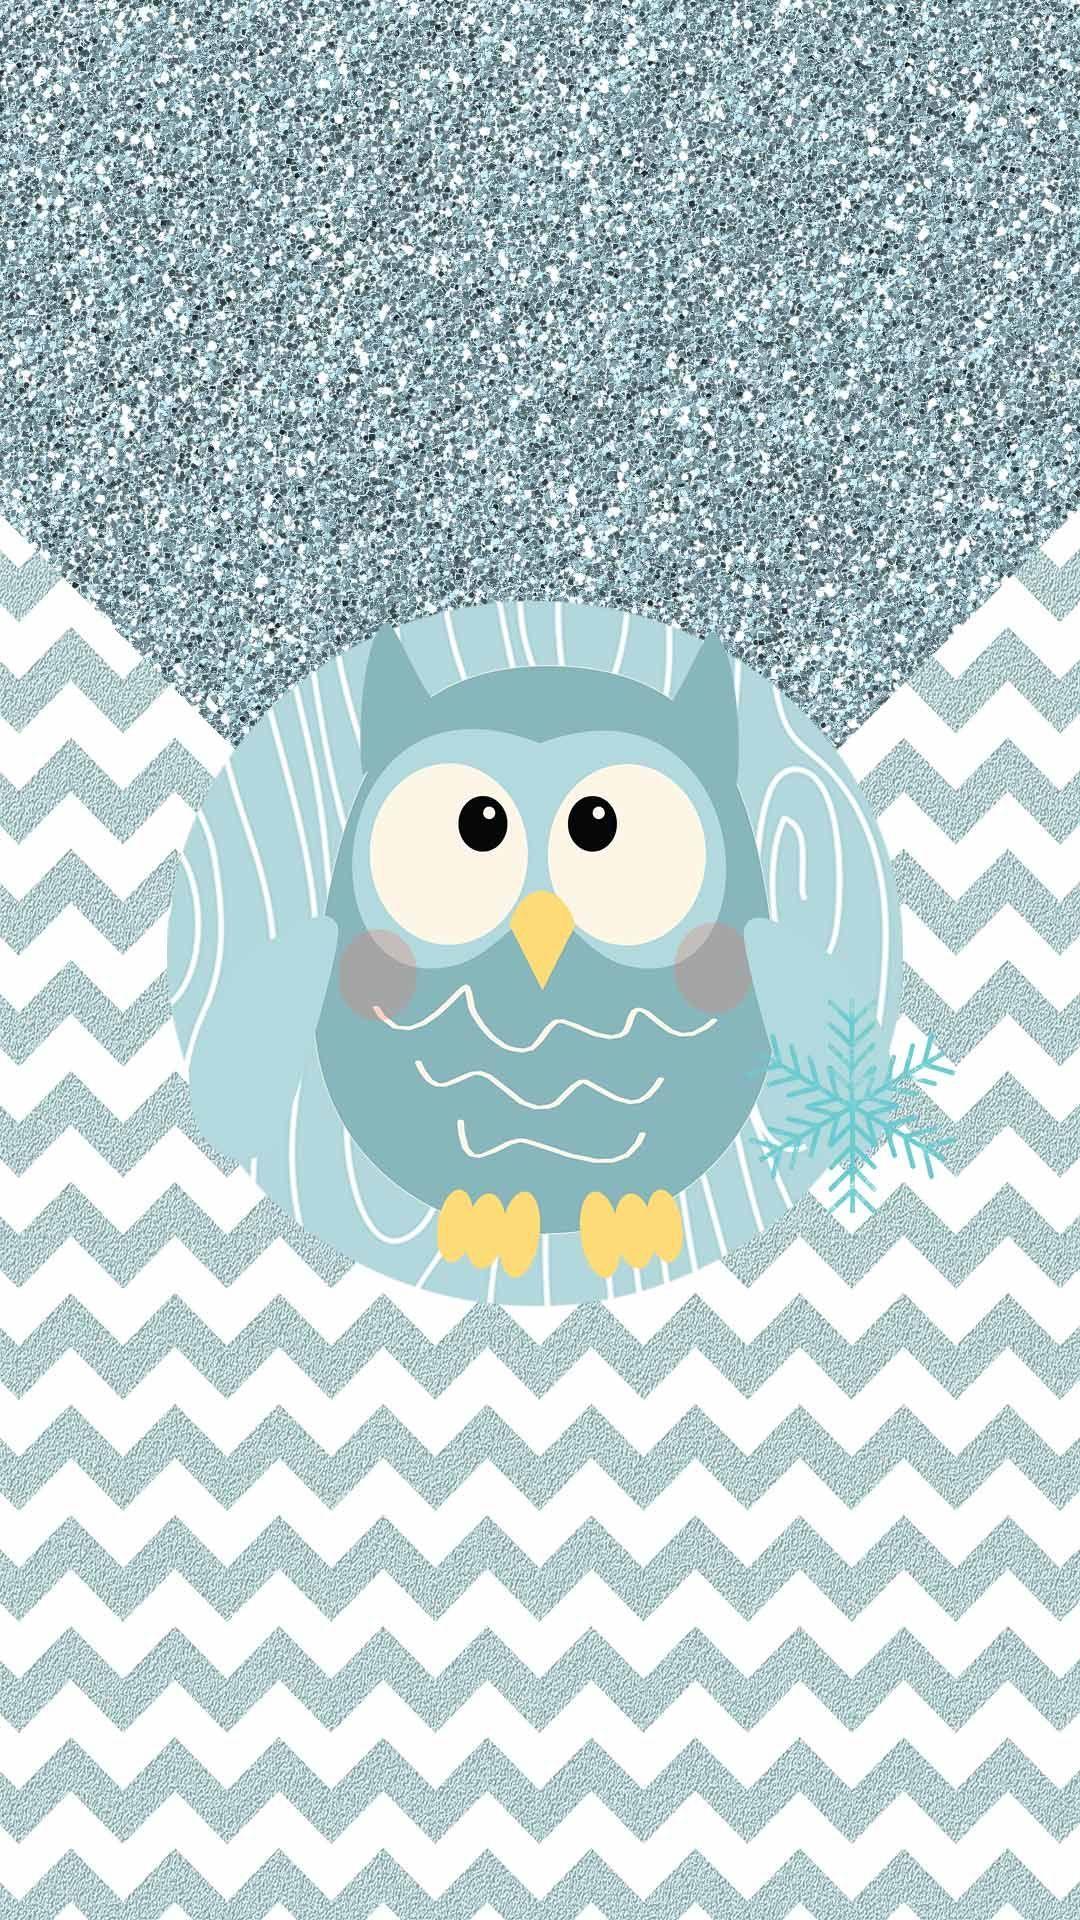 Cute Owl Photo Cute Owls Wallpaper Owl Wallpaper Iphone Wallpaper Winter